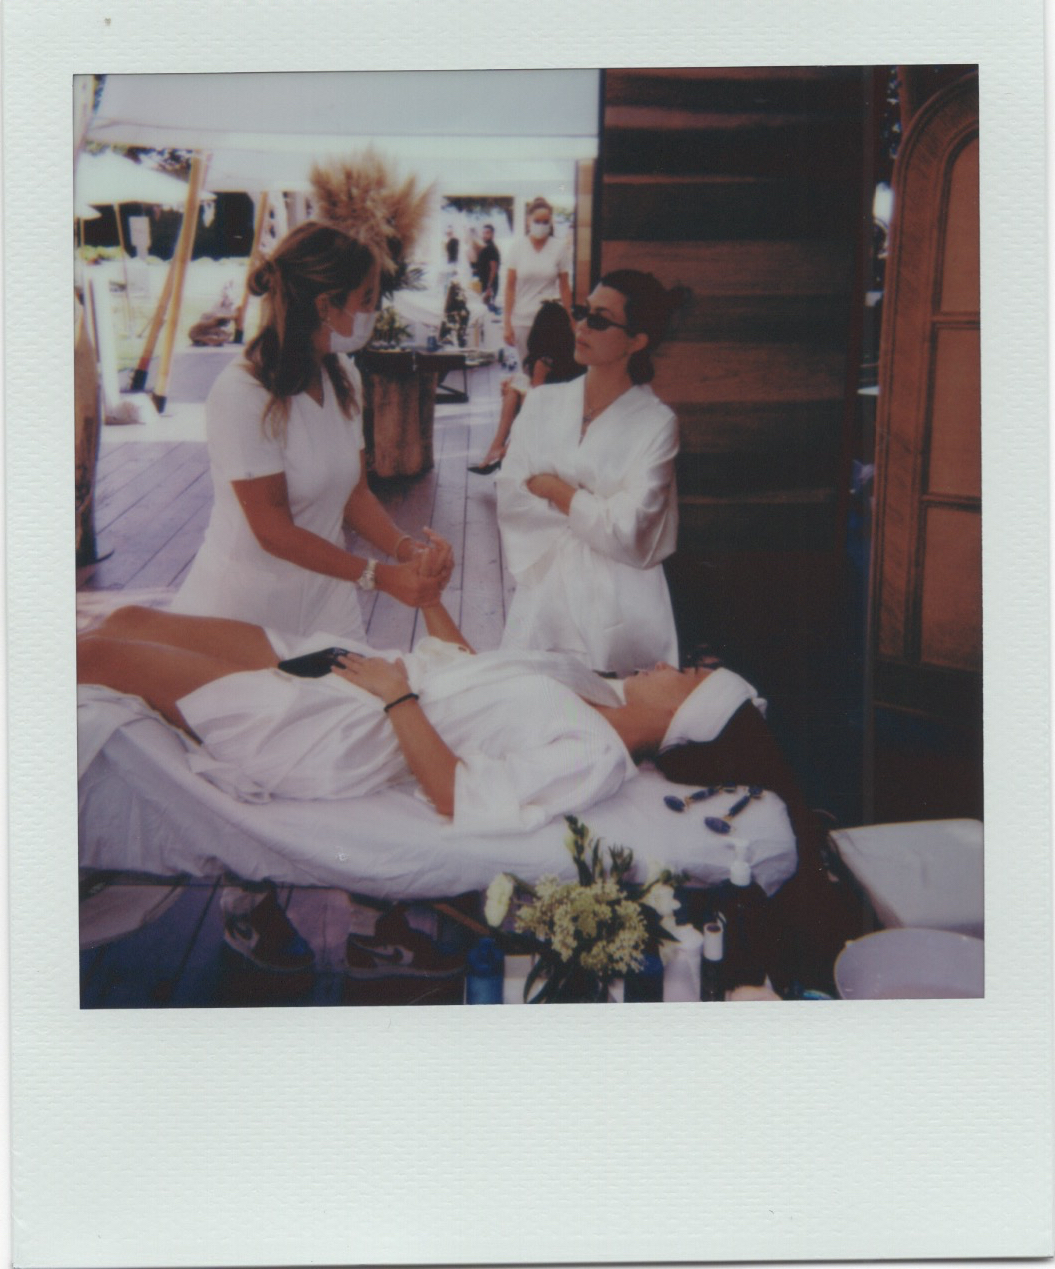 kourtney kardashian in white robe at poolside poosh event talking to person getting massage